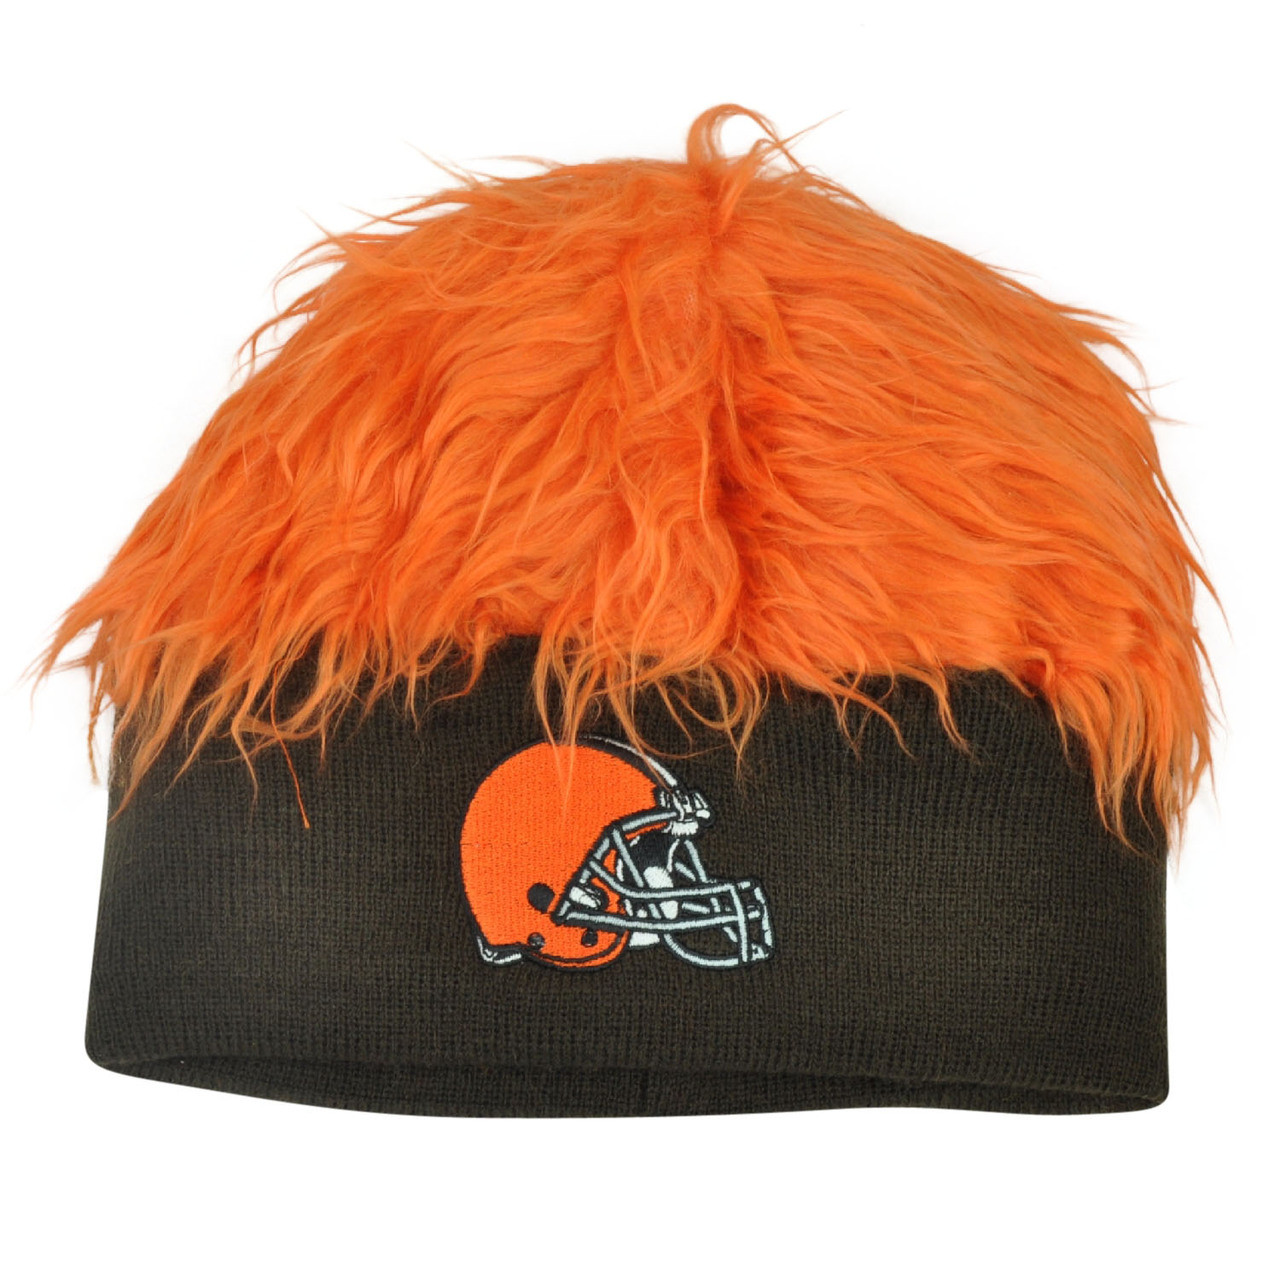 NFL Cleveland Browns Lure Fuzz Hair Headband Knit Beanie Fan Game Orange  Hair. Price   14.95. Image 1 91ba47816